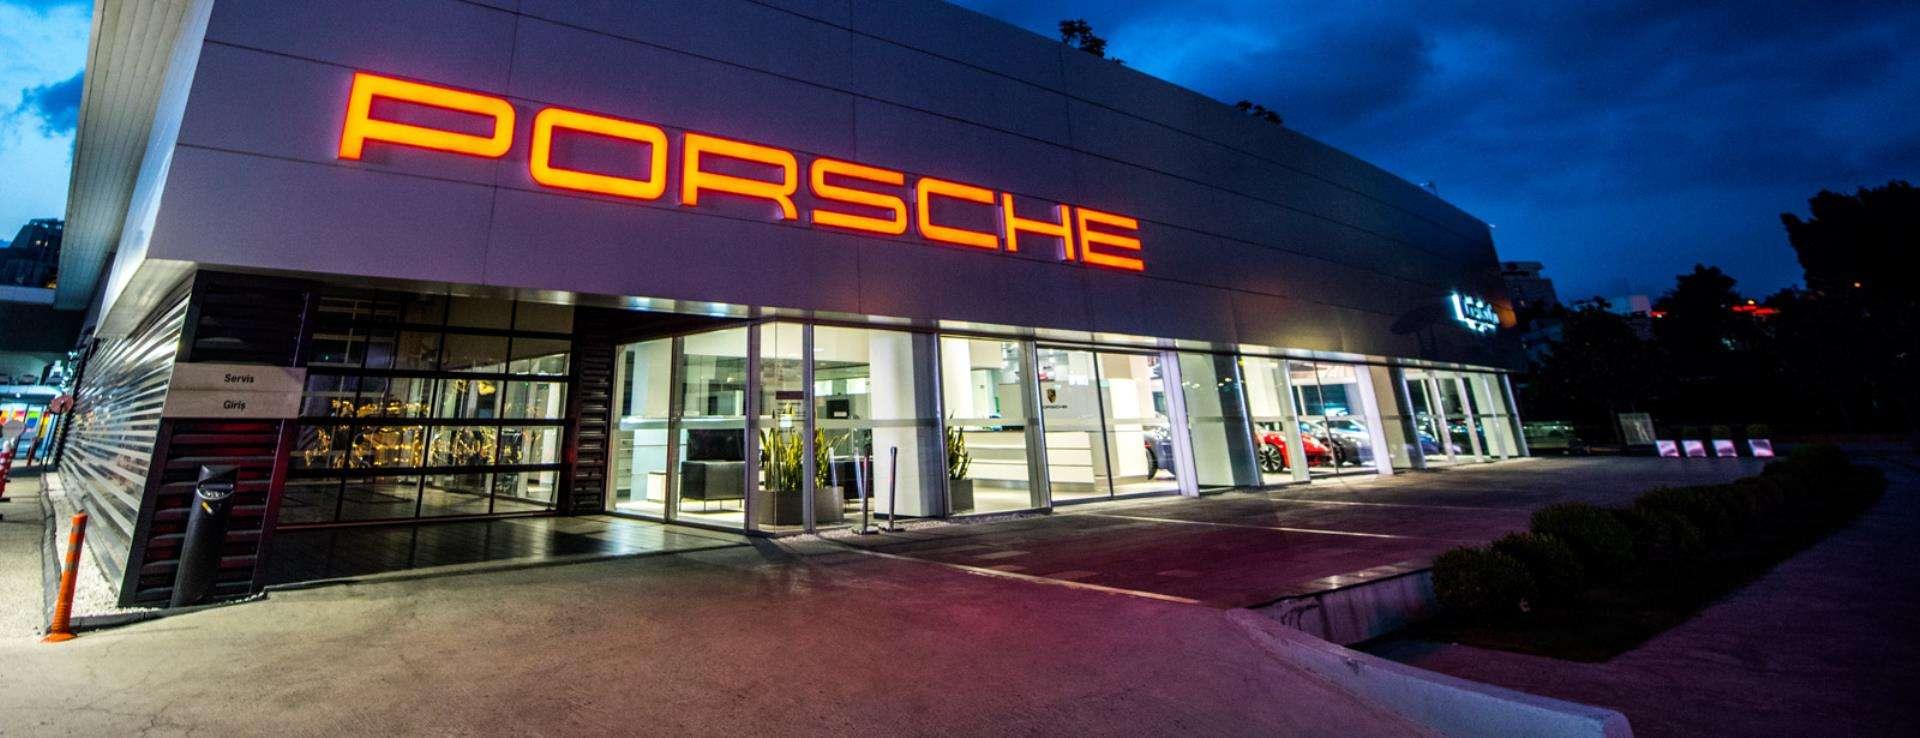 Porsche - Doğuş Oto Maslak Porsche